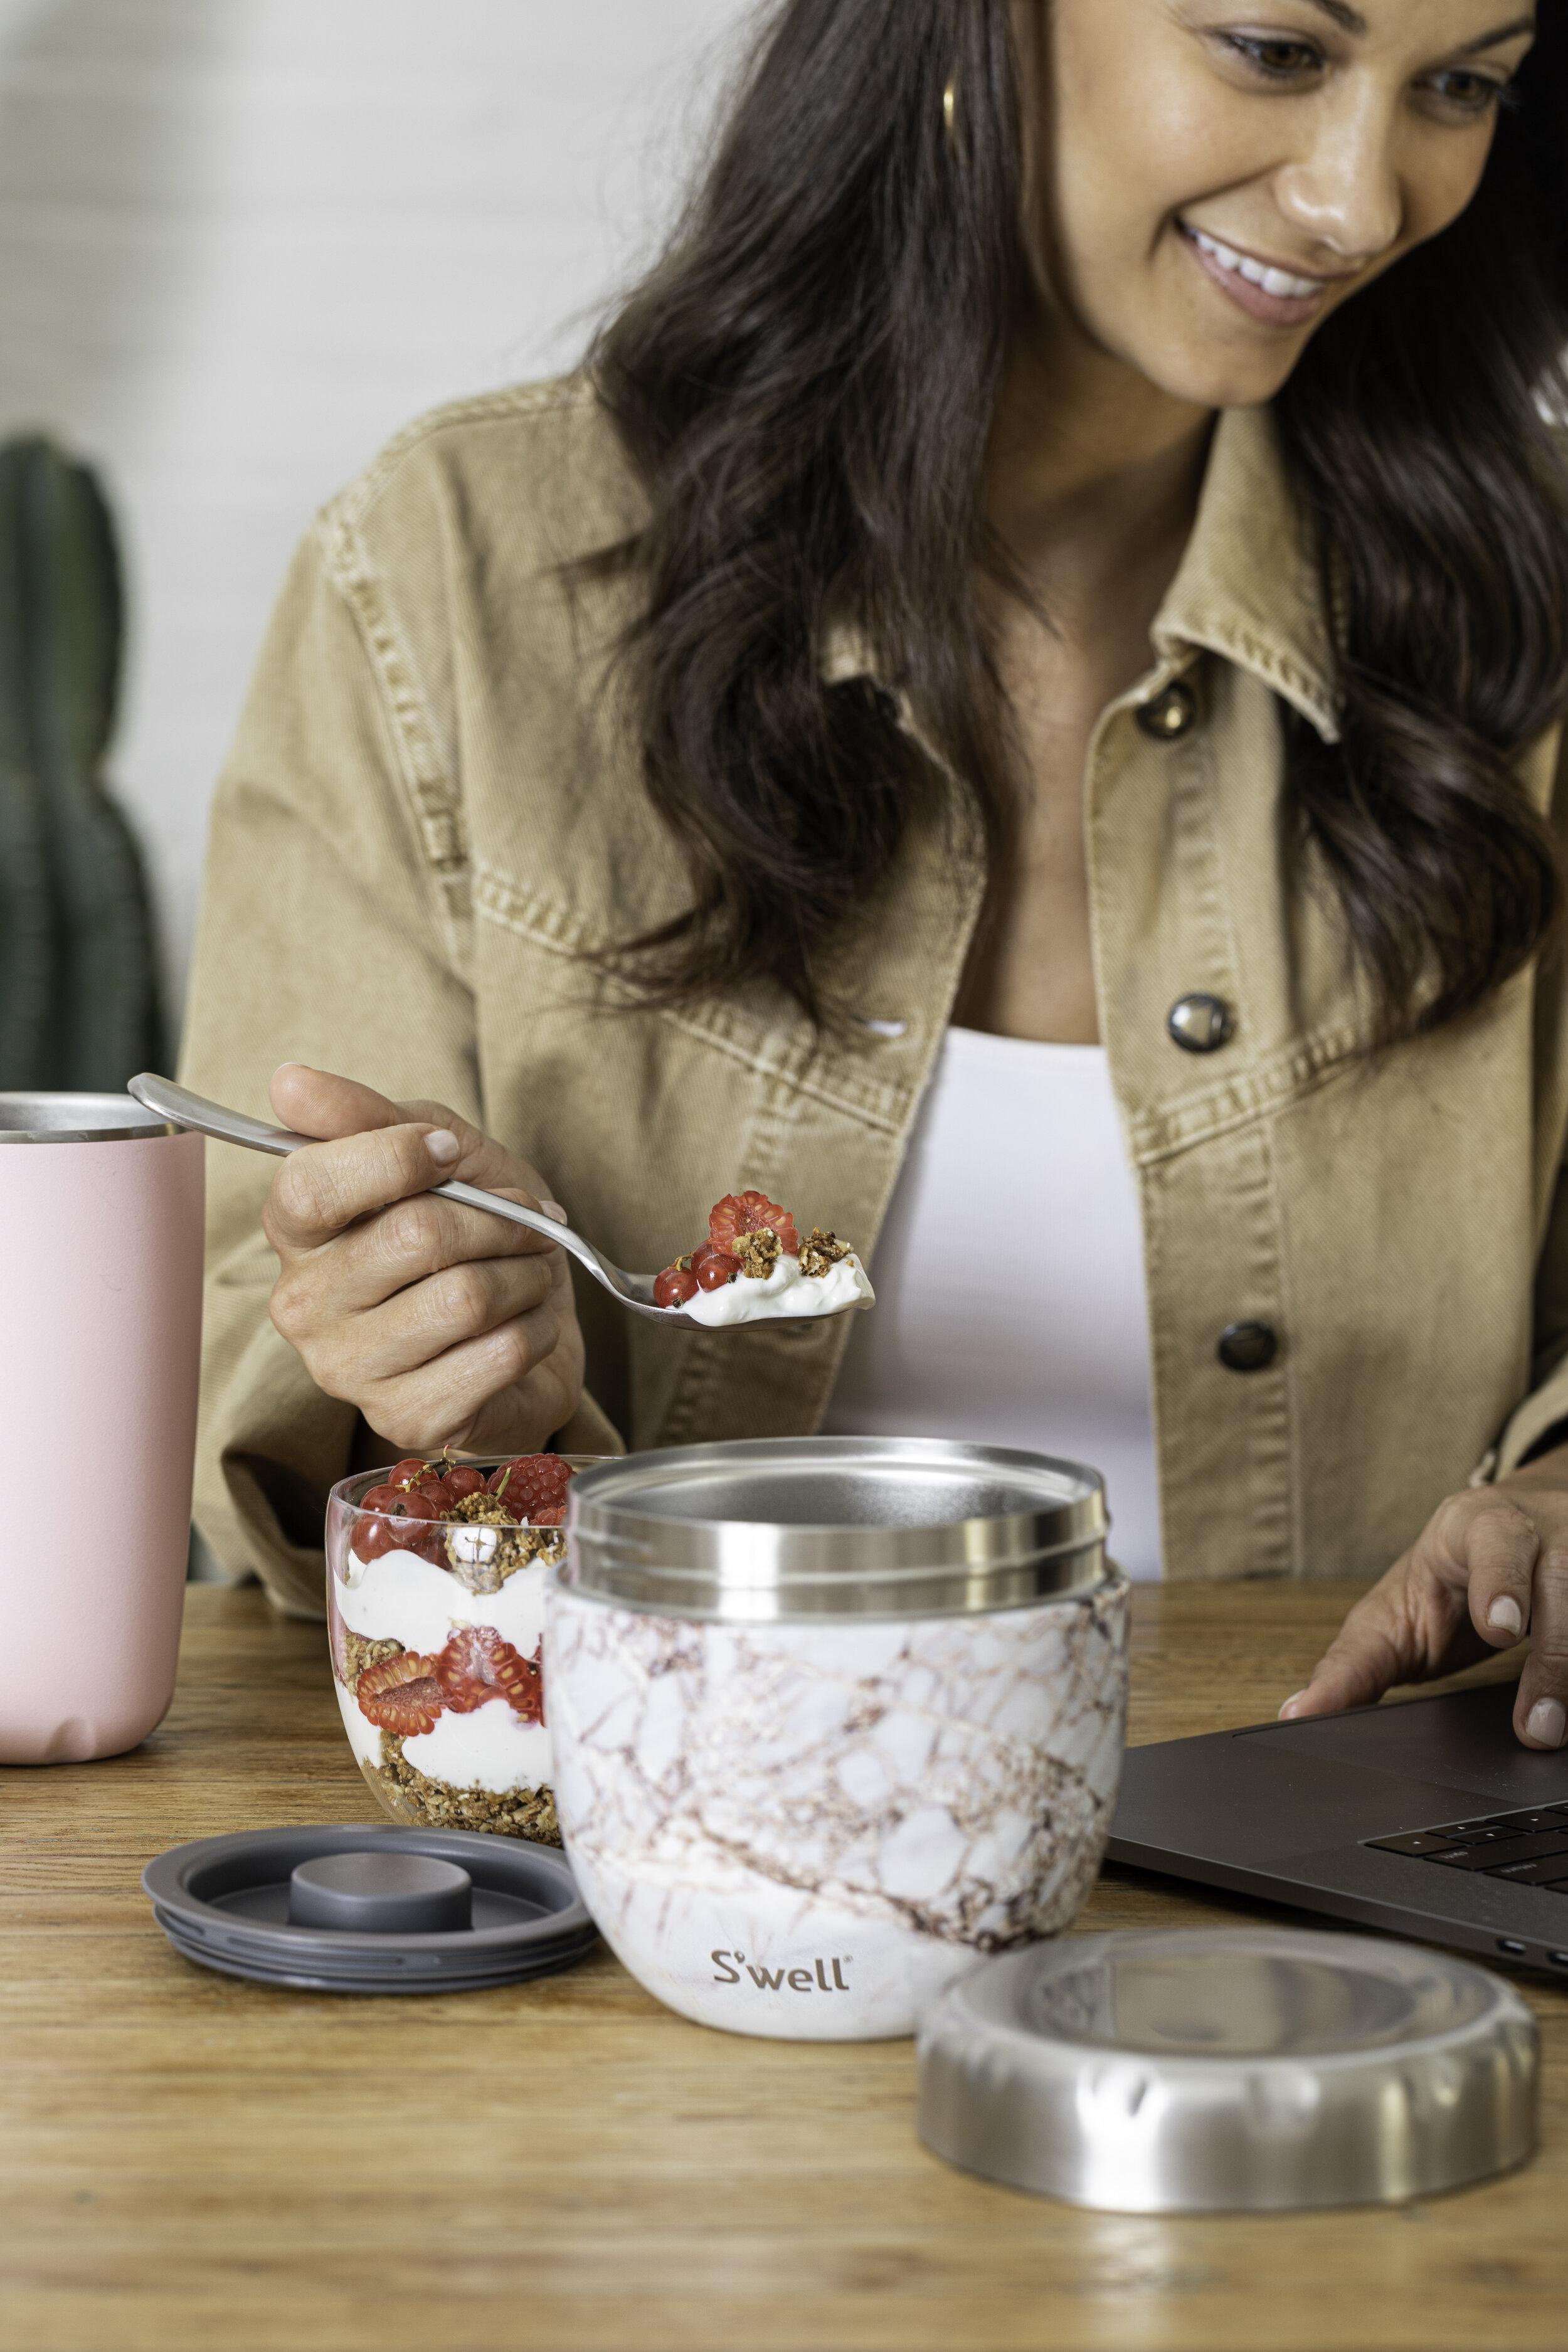 S'well Eats Raspberry Yogurt Parfait.  Photographer: Maria Midoes, Food Stylist: Judy Kim , Prop Stylist: Maya Rossi